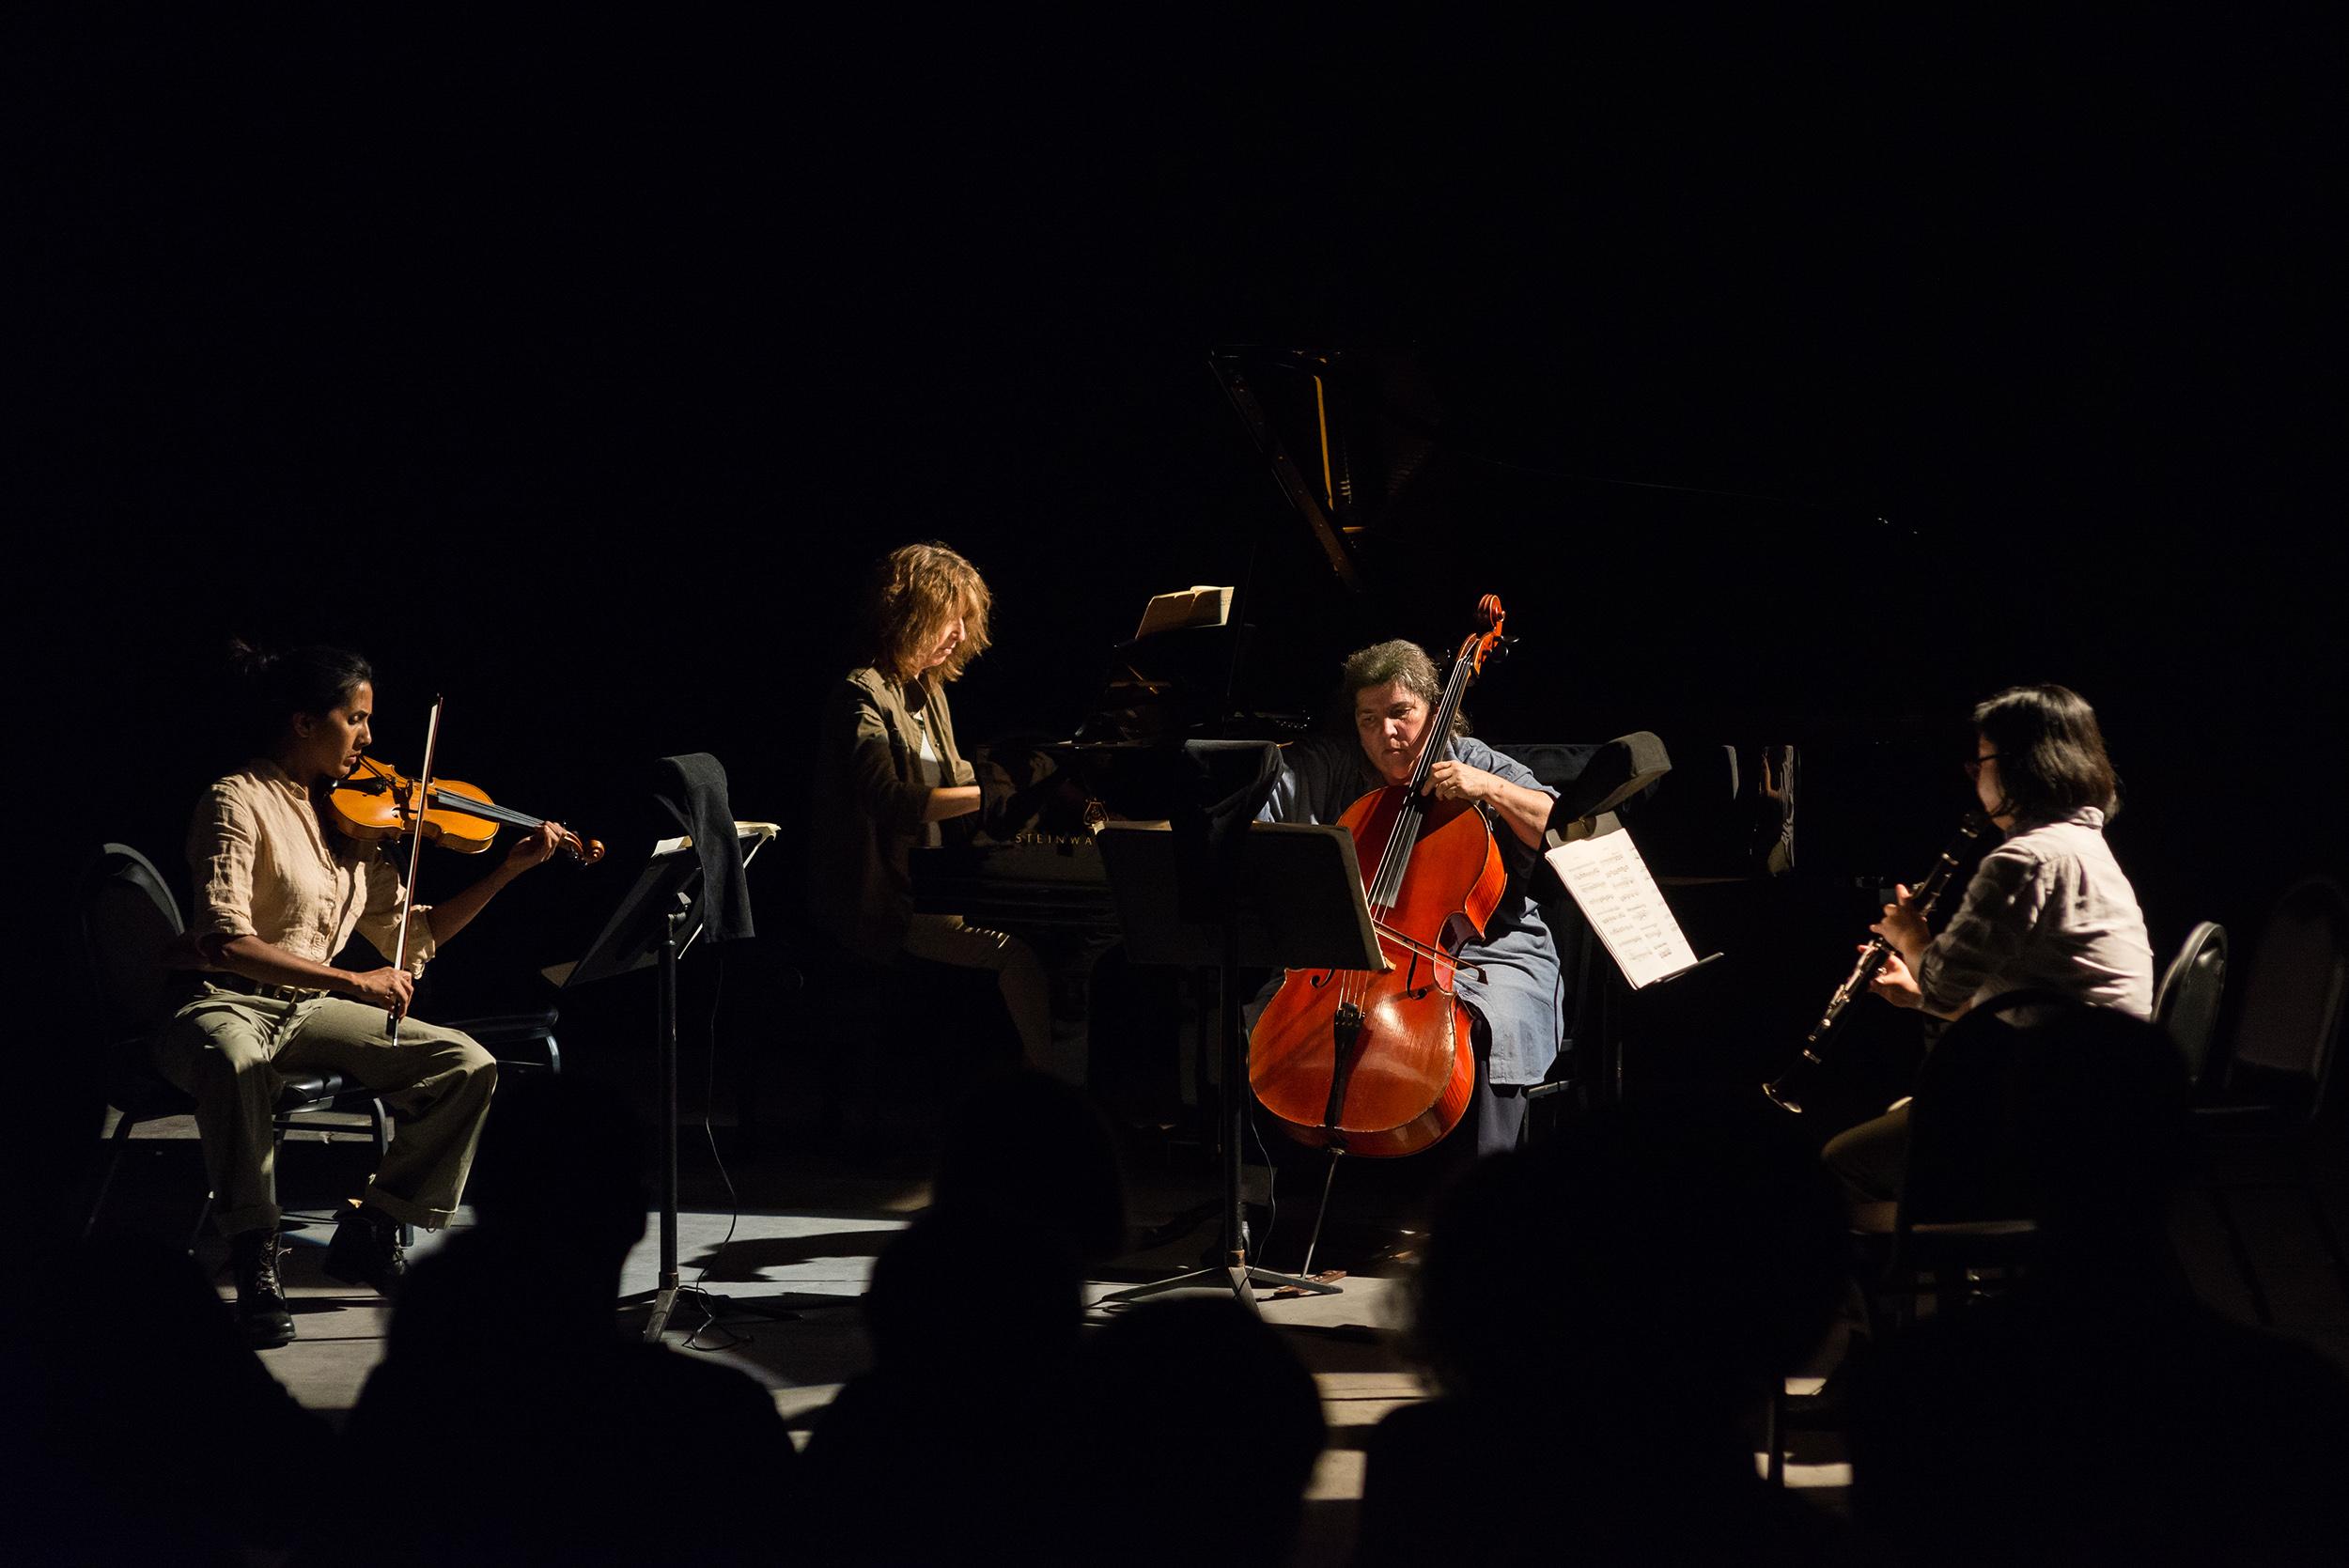 quartet_15.jpg